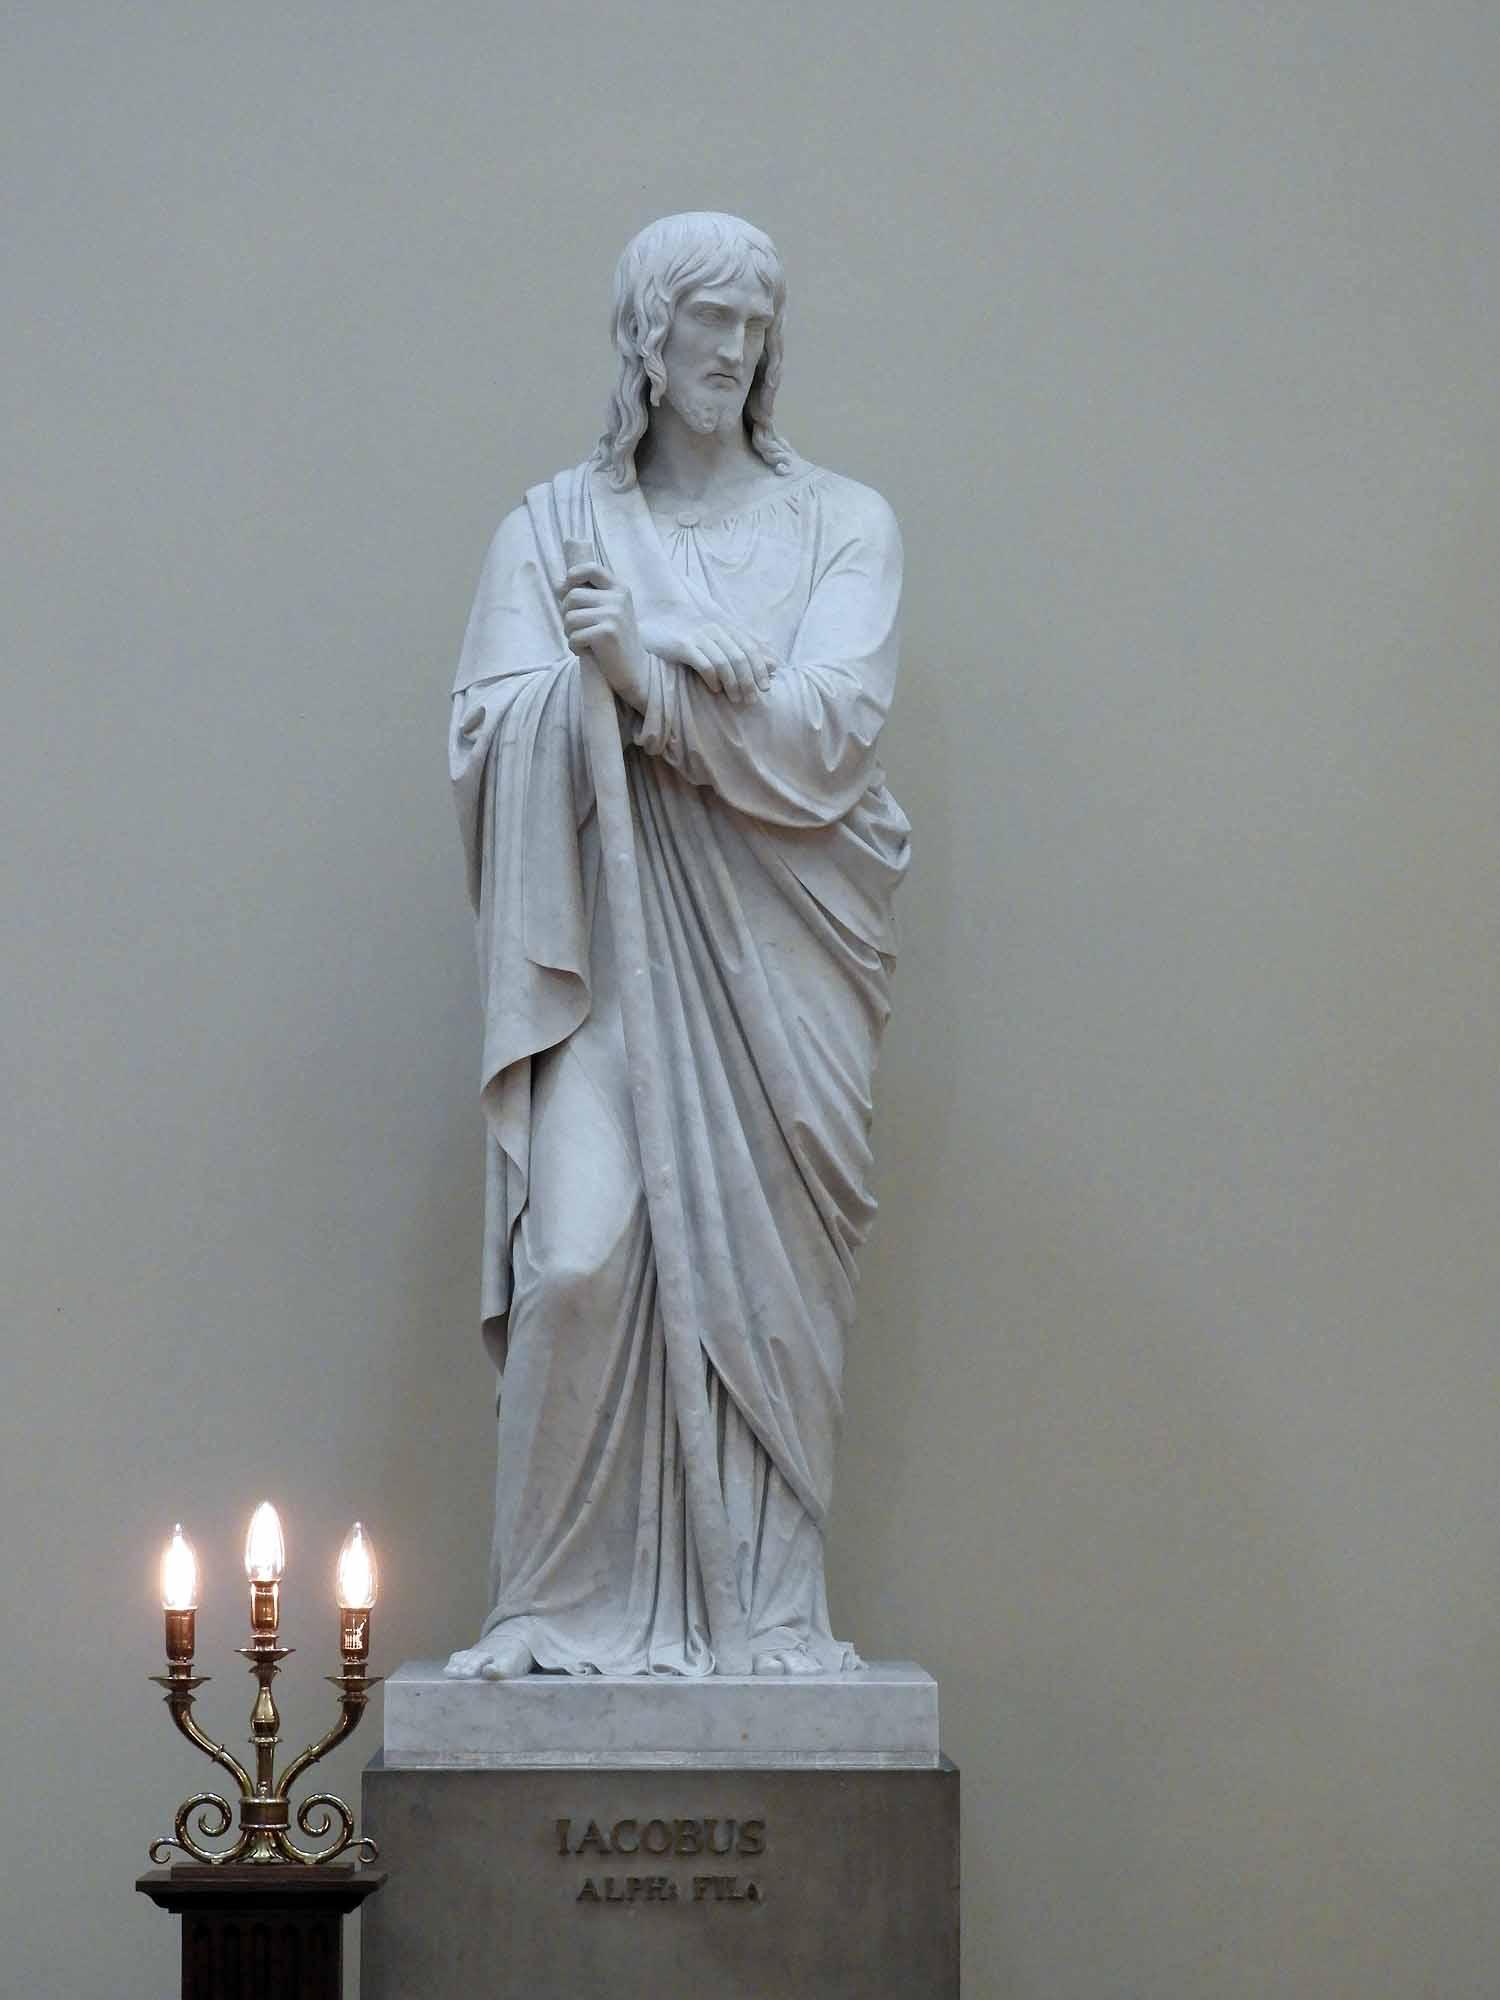 denmark-copenhagen-vor-frue-kirke-cathederal-apostle -iacobus-james.JPG